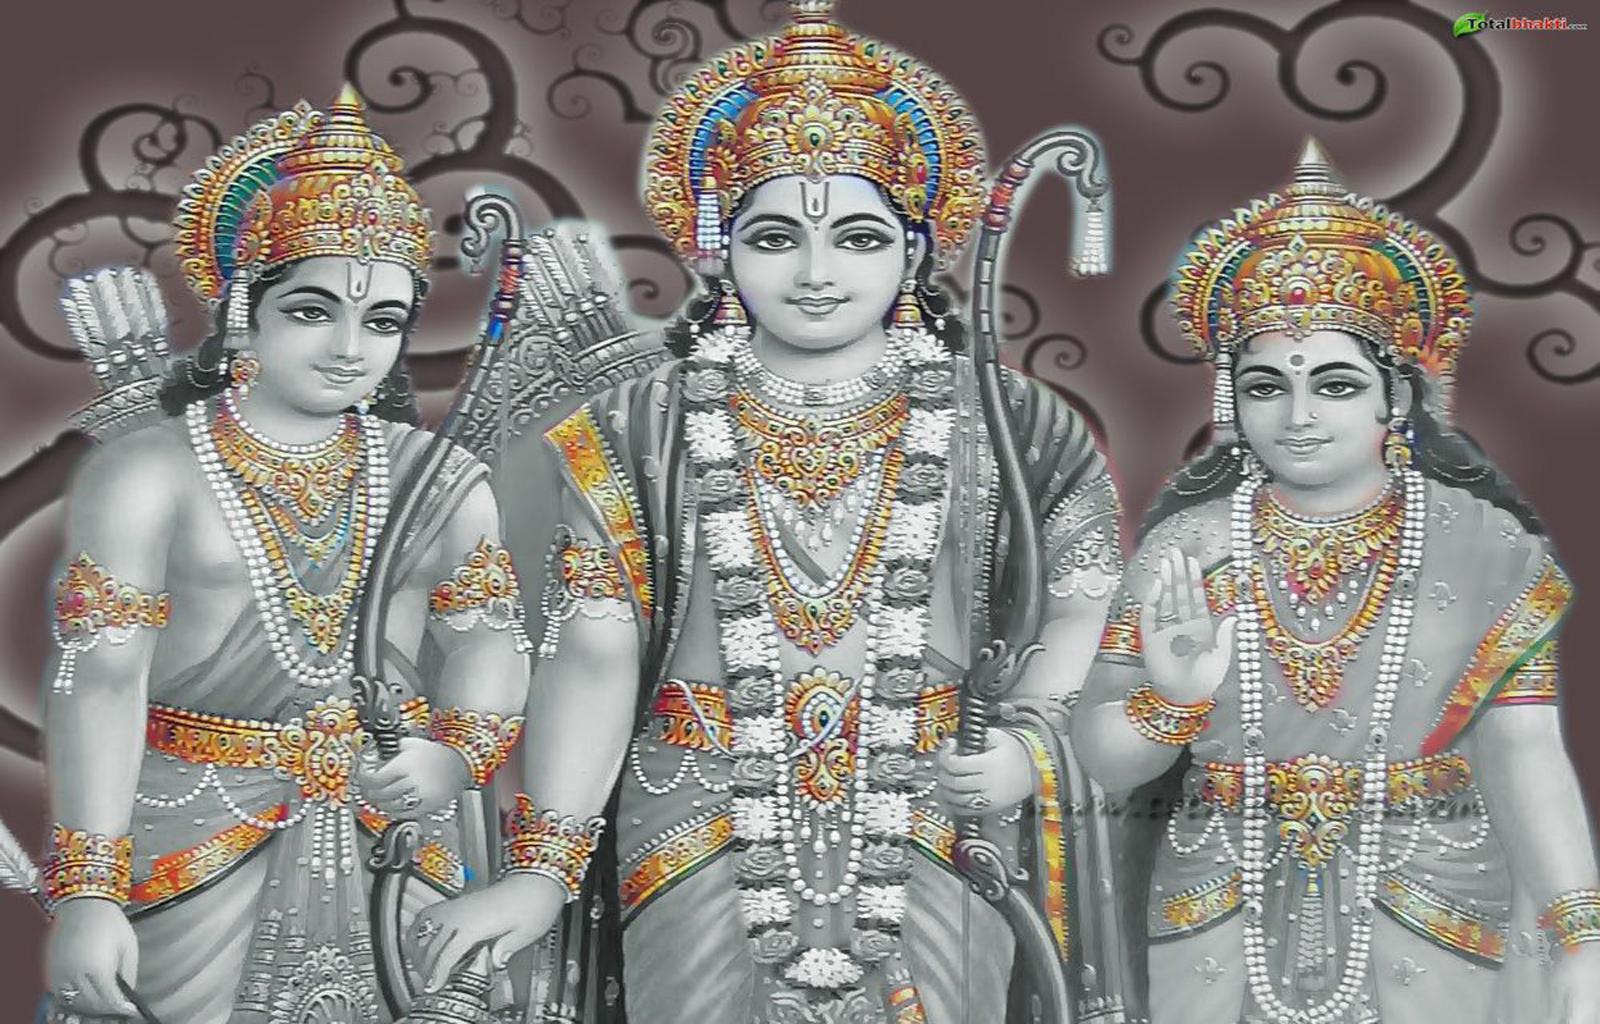 http://2.bp.blogspot.com/-JBfp7ek9a3U/T-l2vJBElcI/AAAAAAAADPQ/Jr_-ZITM5ec/s1600/Lord-Ram-with-Sita-5.jpg